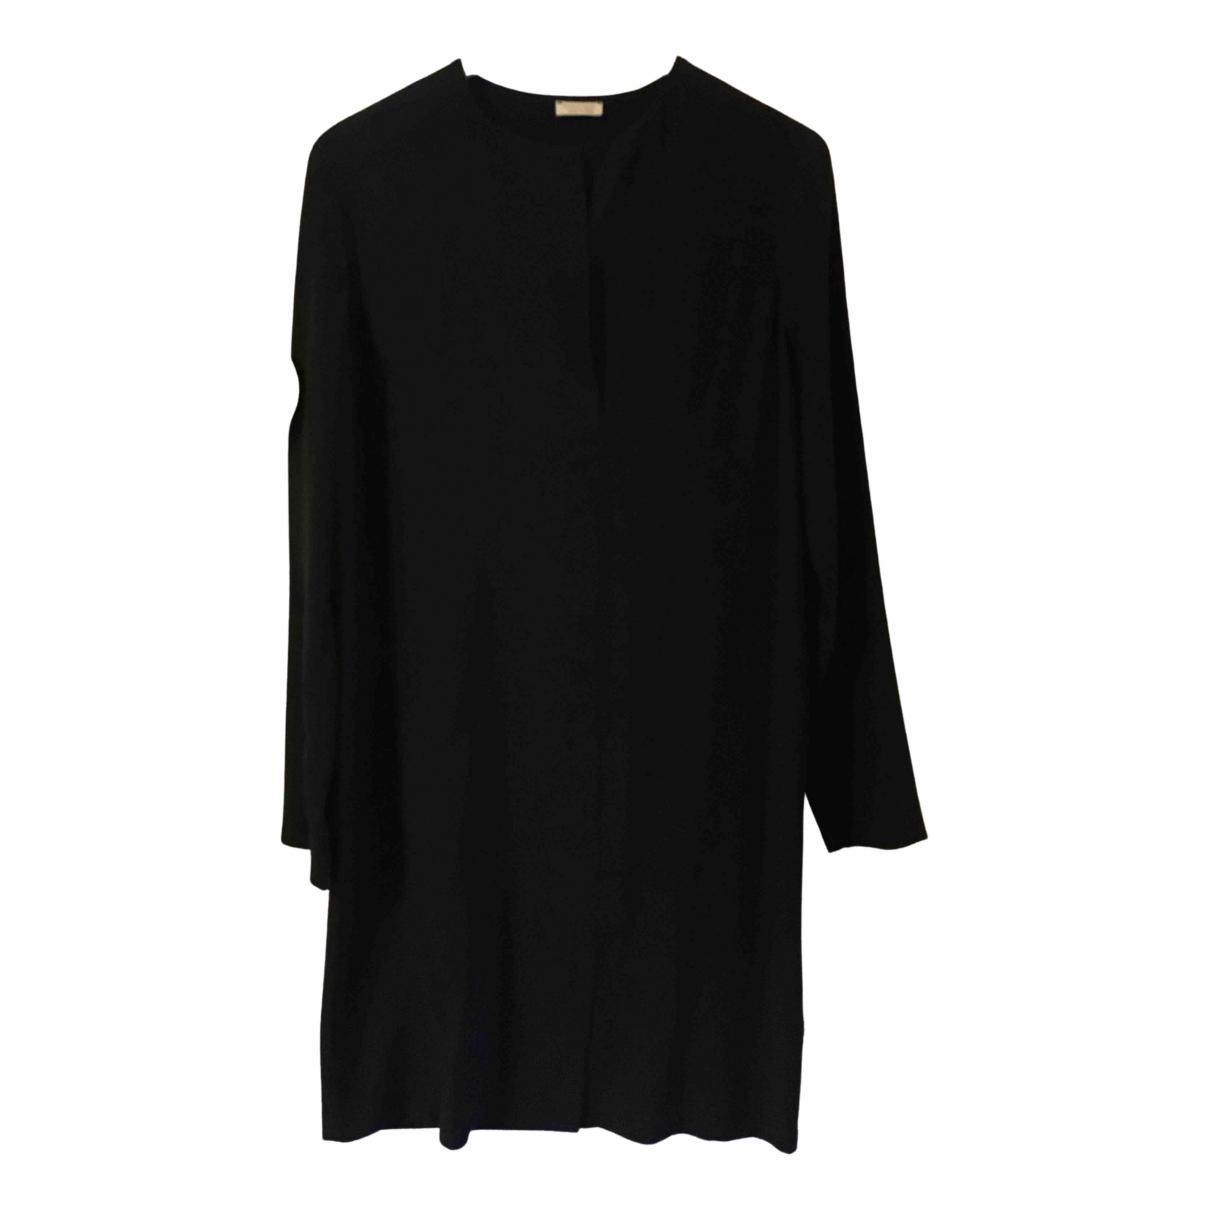 Falconeri \N Kleid in  Schwarz Seide